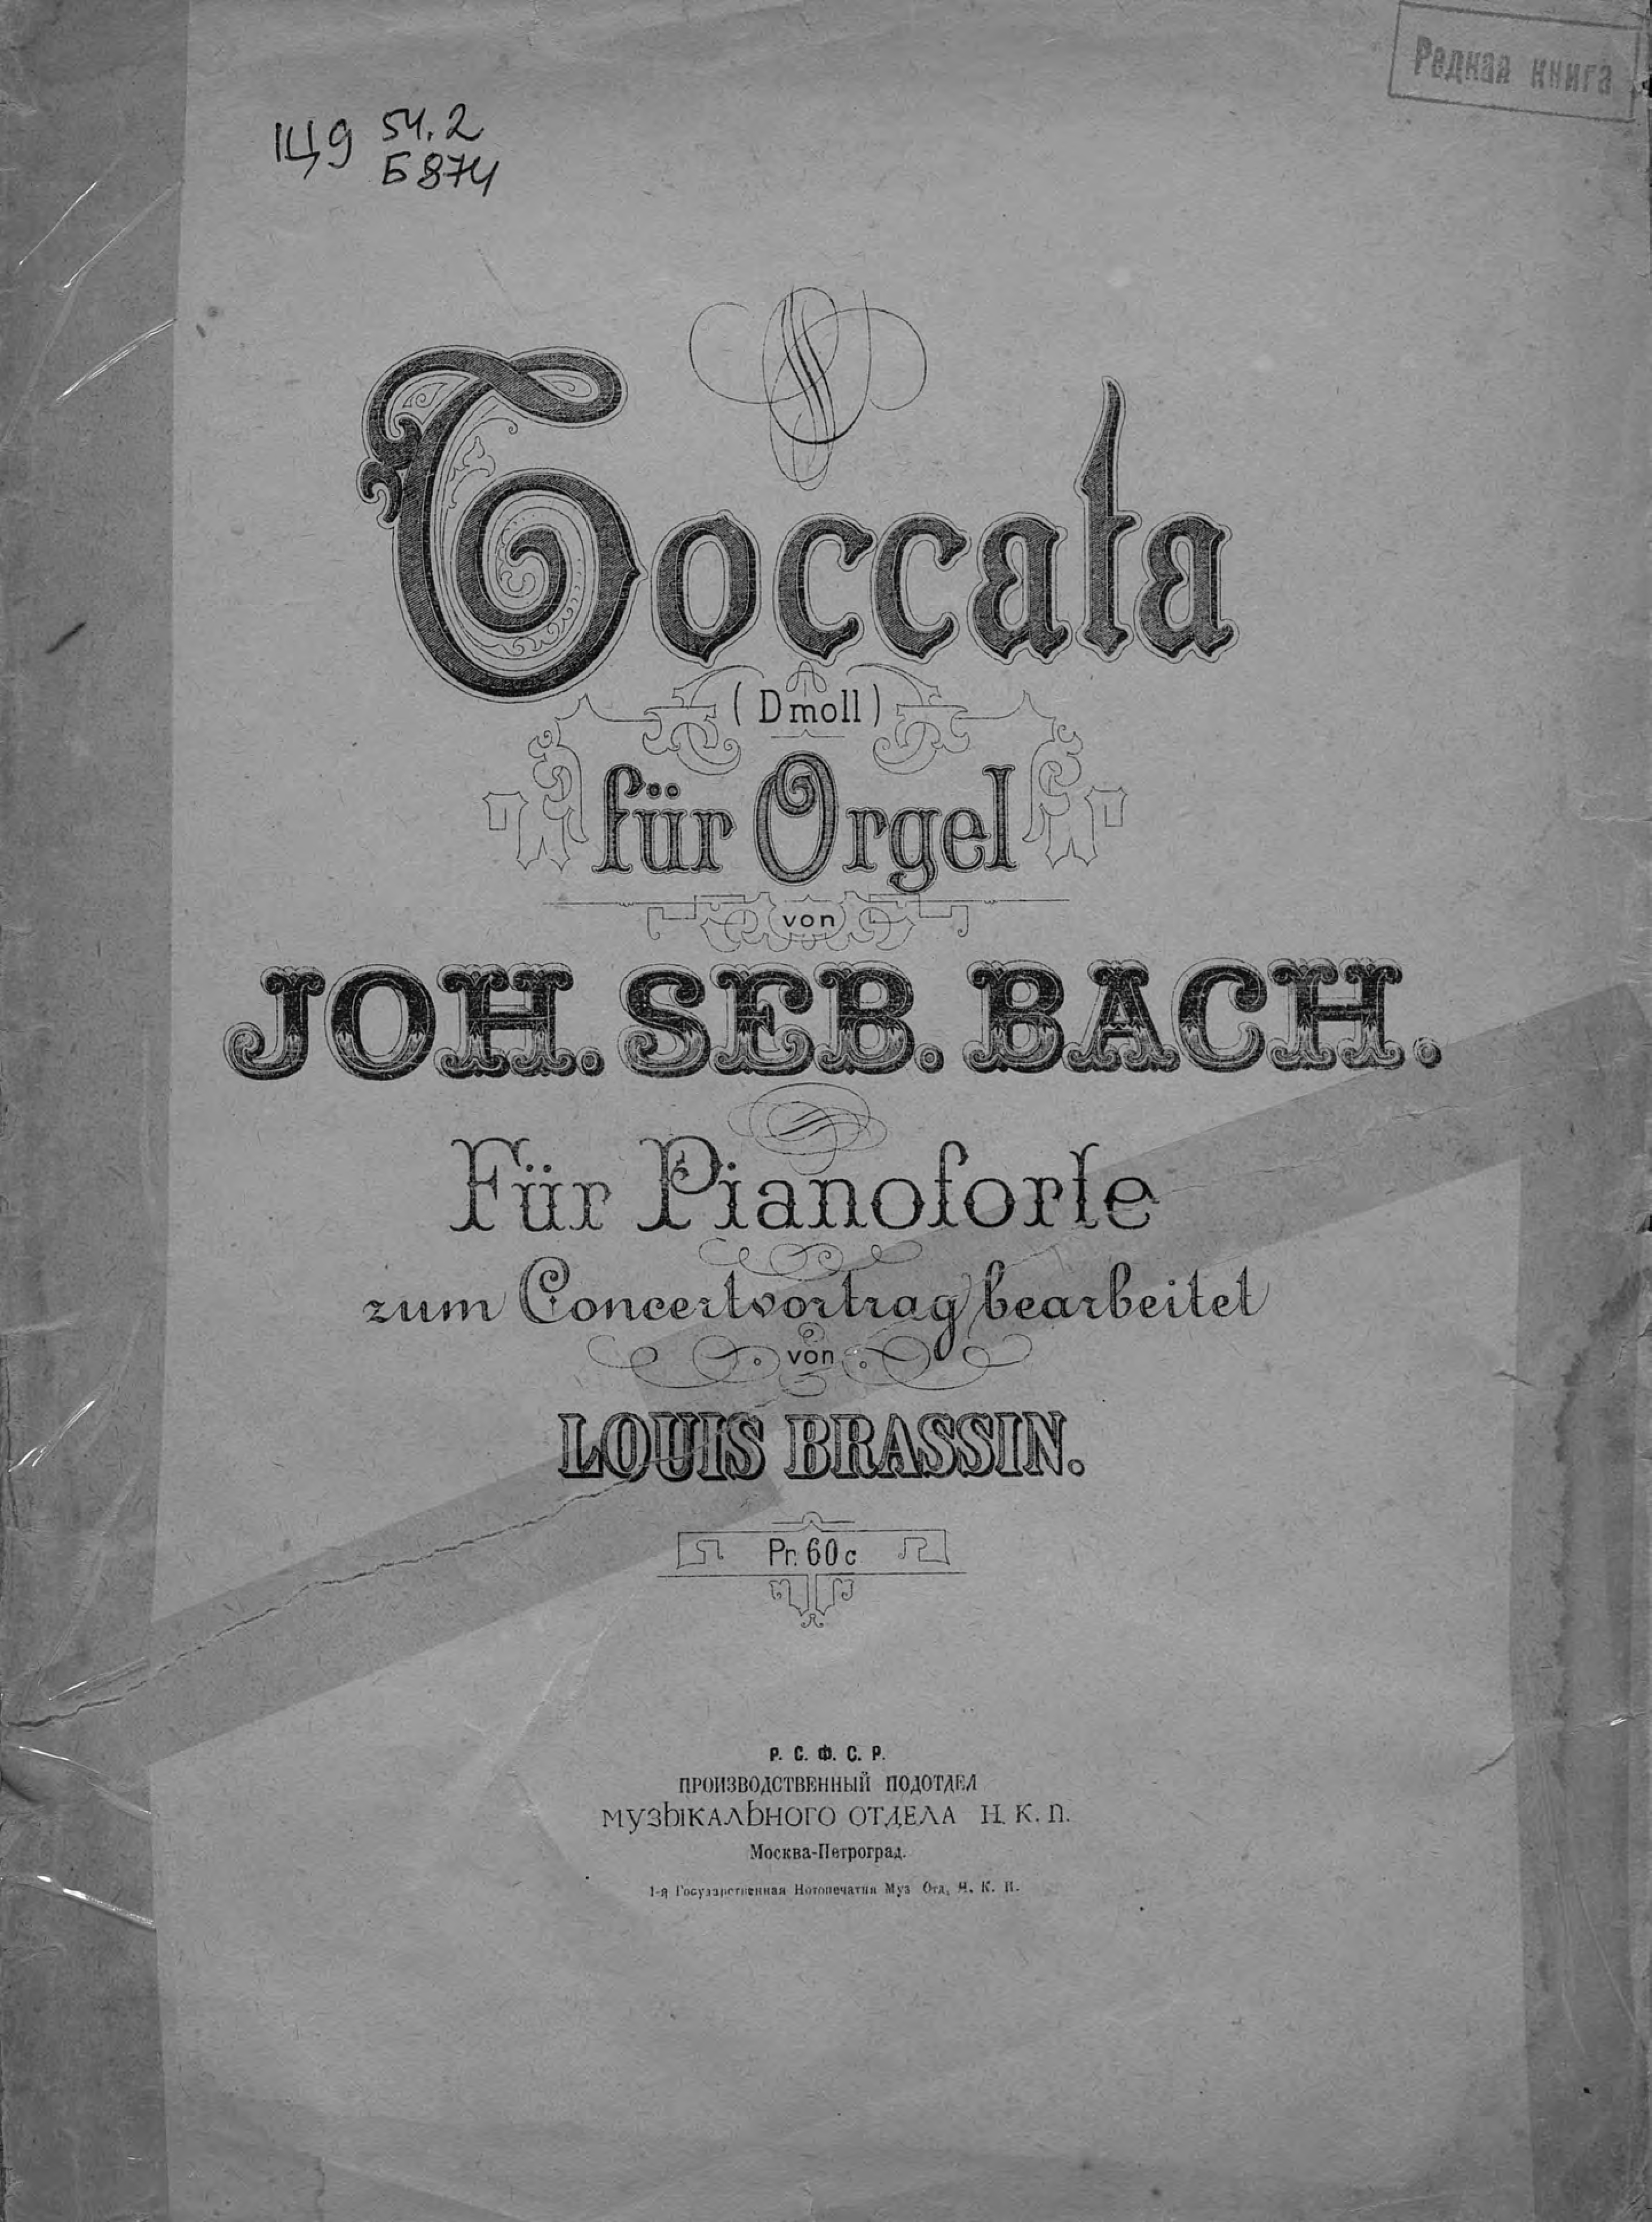 Иоганн Себастьян Бах Toccata D-moll fur Orgel von Joh. Seb. Bach цена и фото